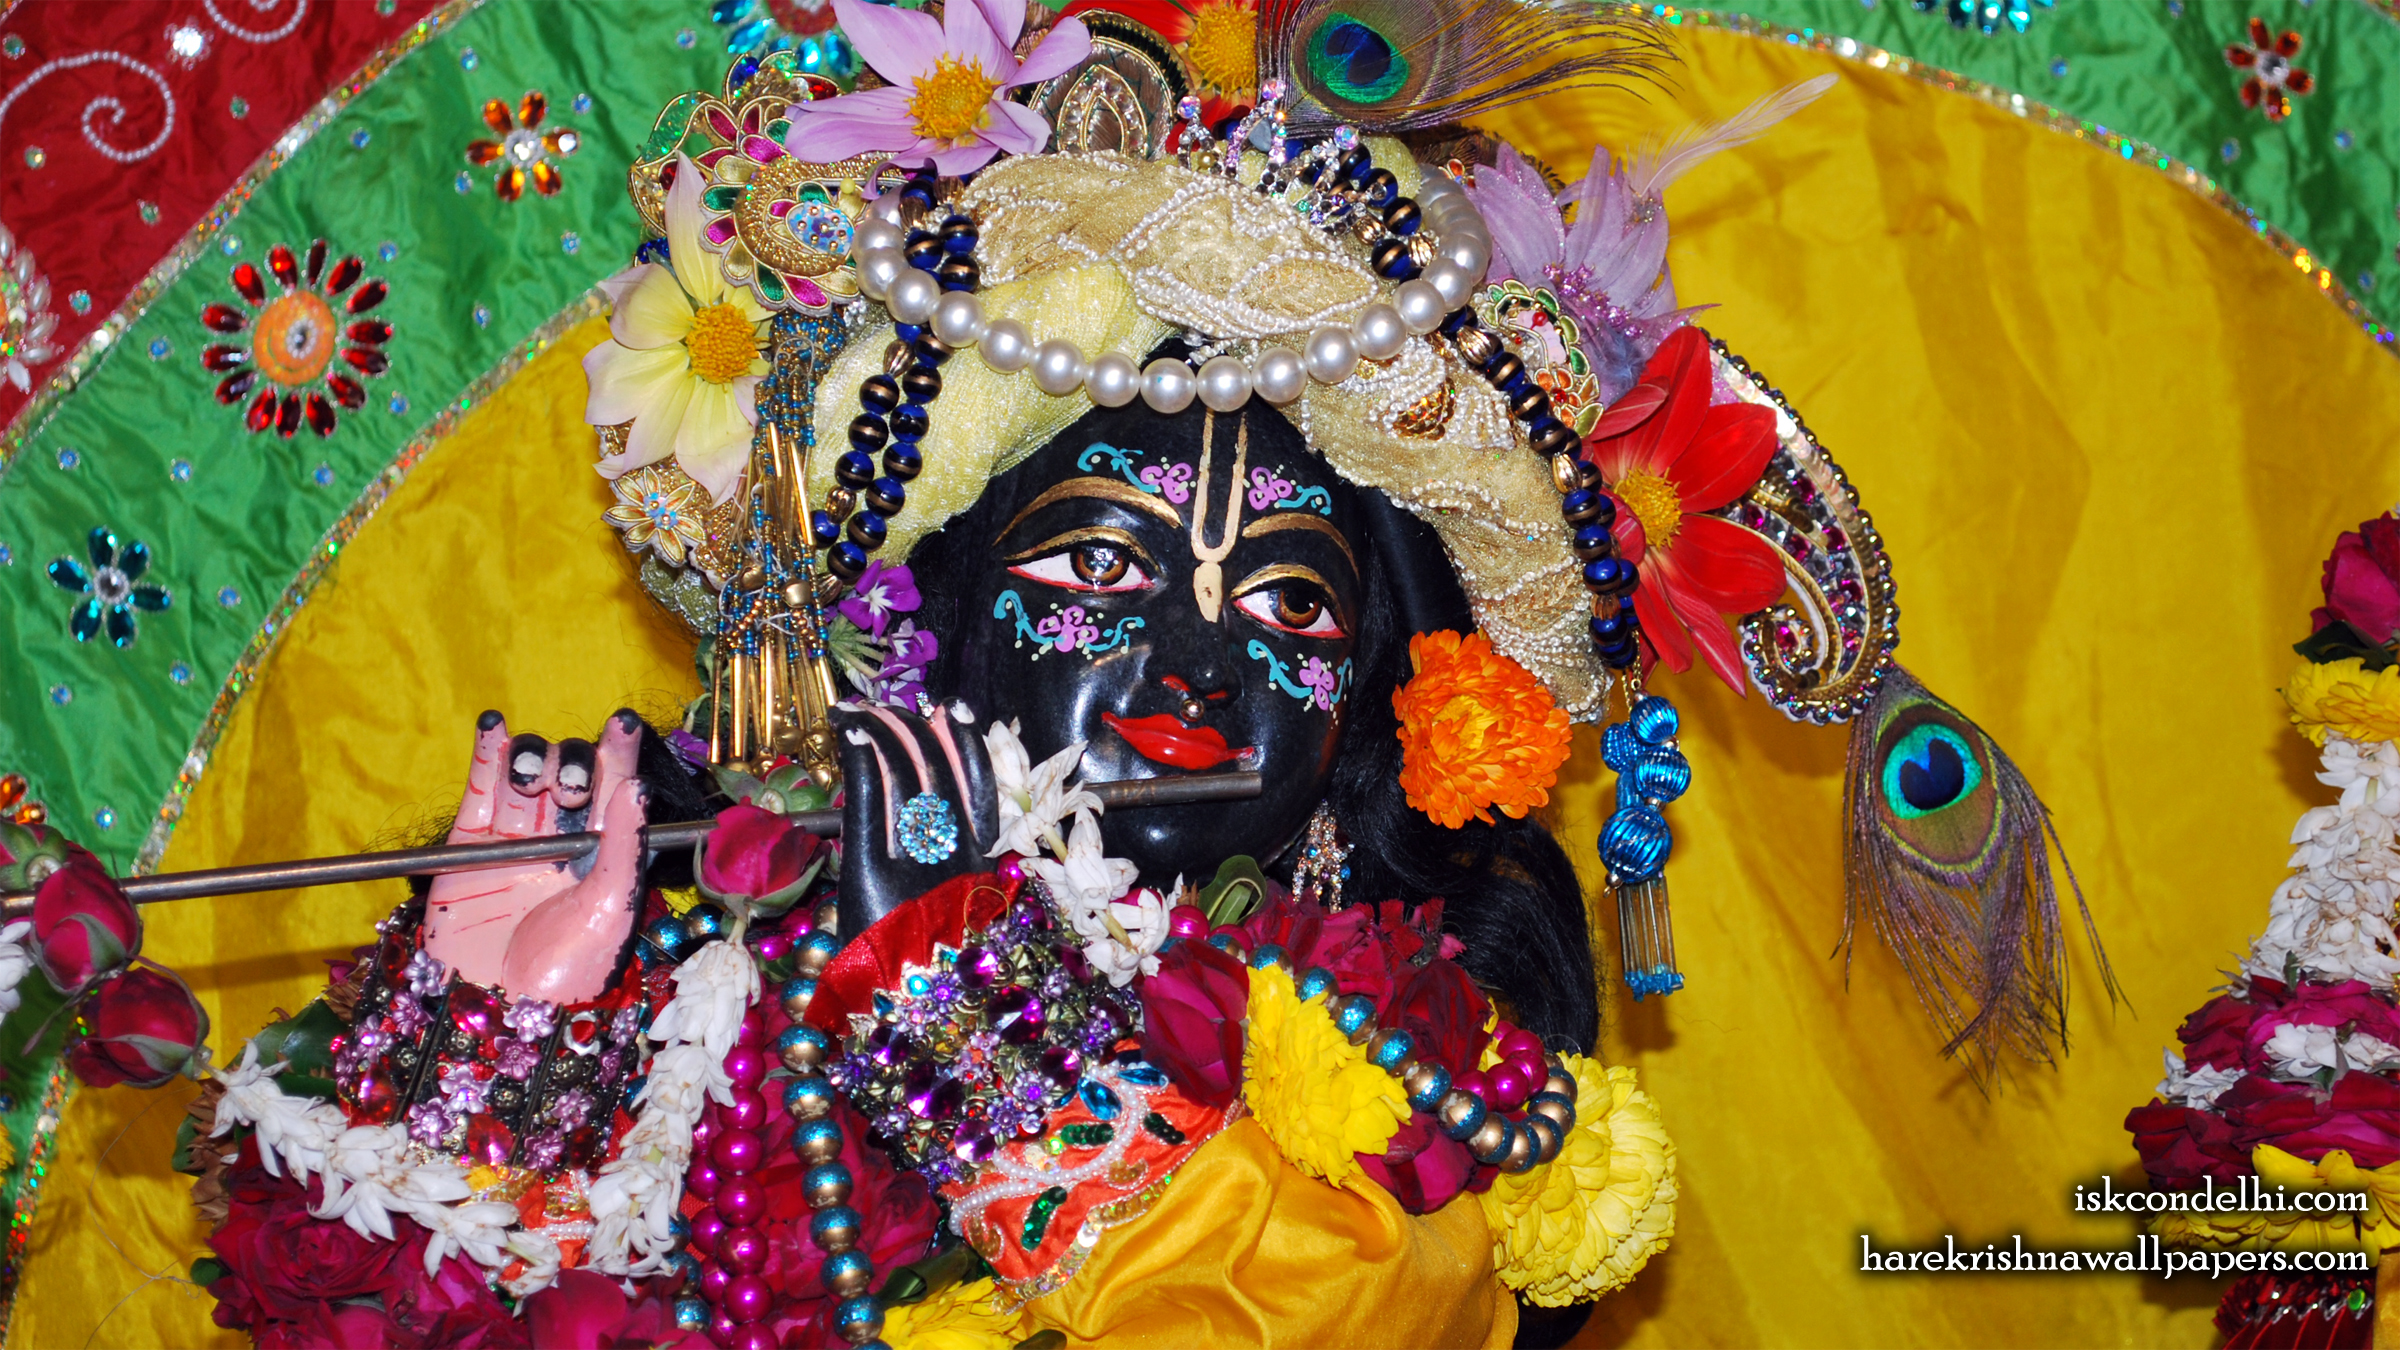 Sri Parthasarathi Close up Wallpaper (017) Size 2400x1350 Download